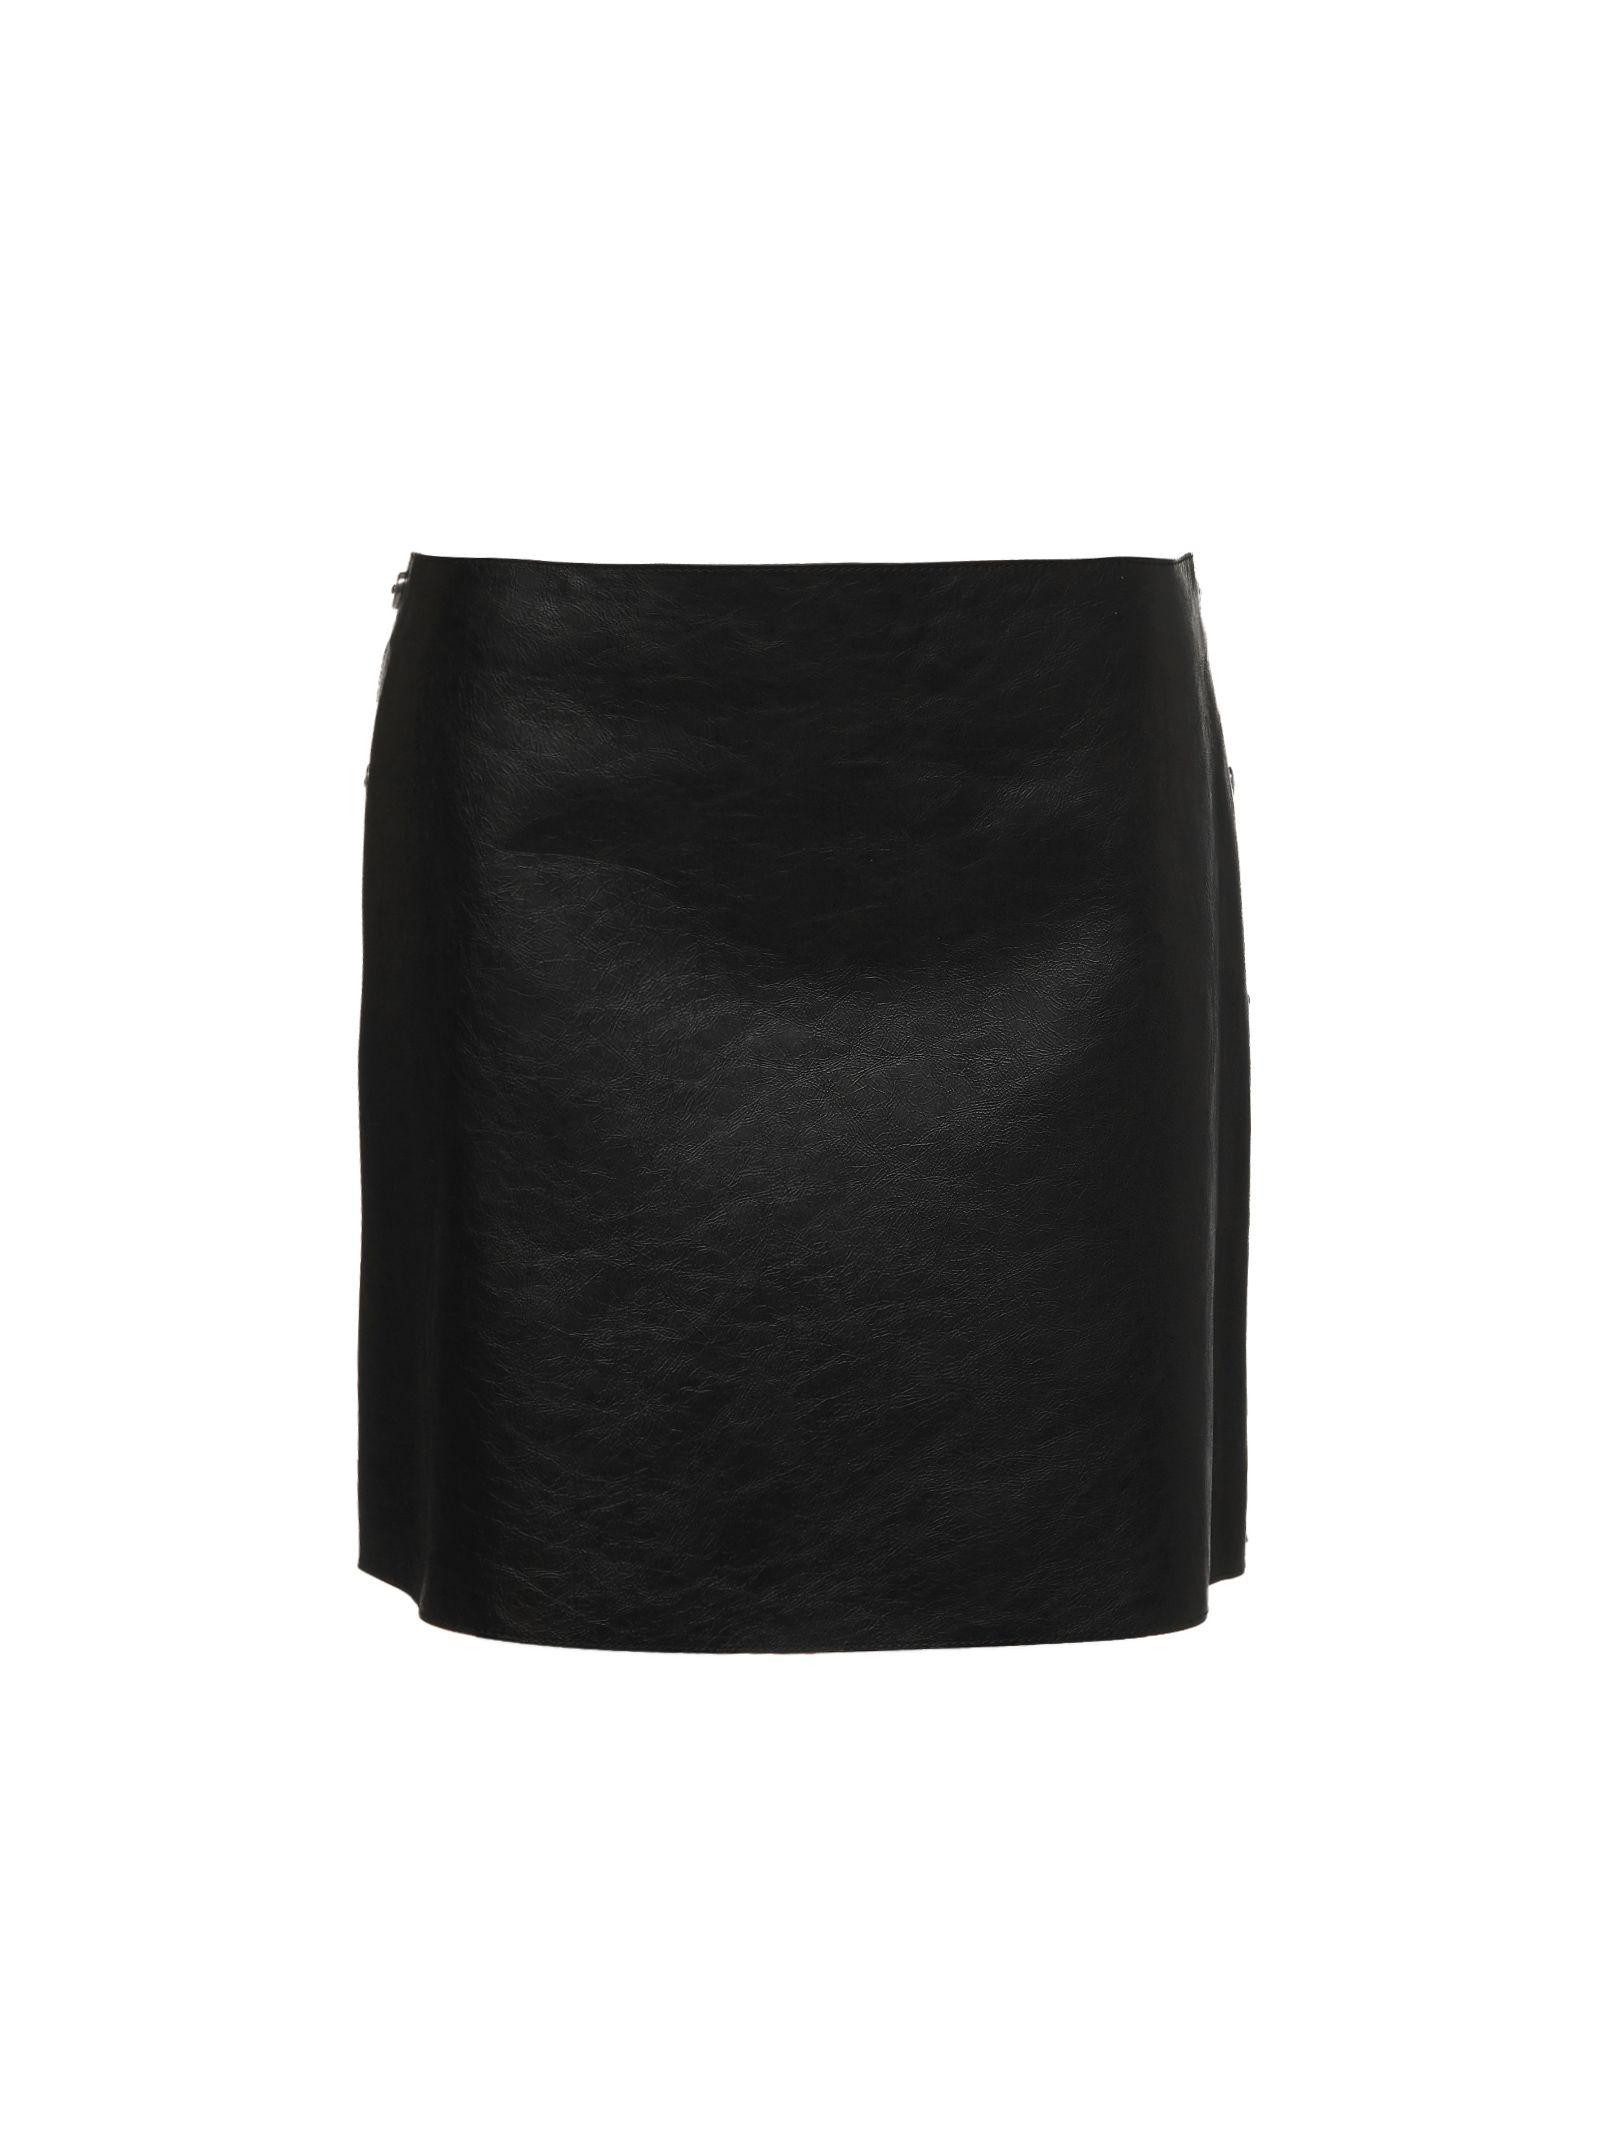 sonia by sonia rykiel -  Crackled Mini Skirt